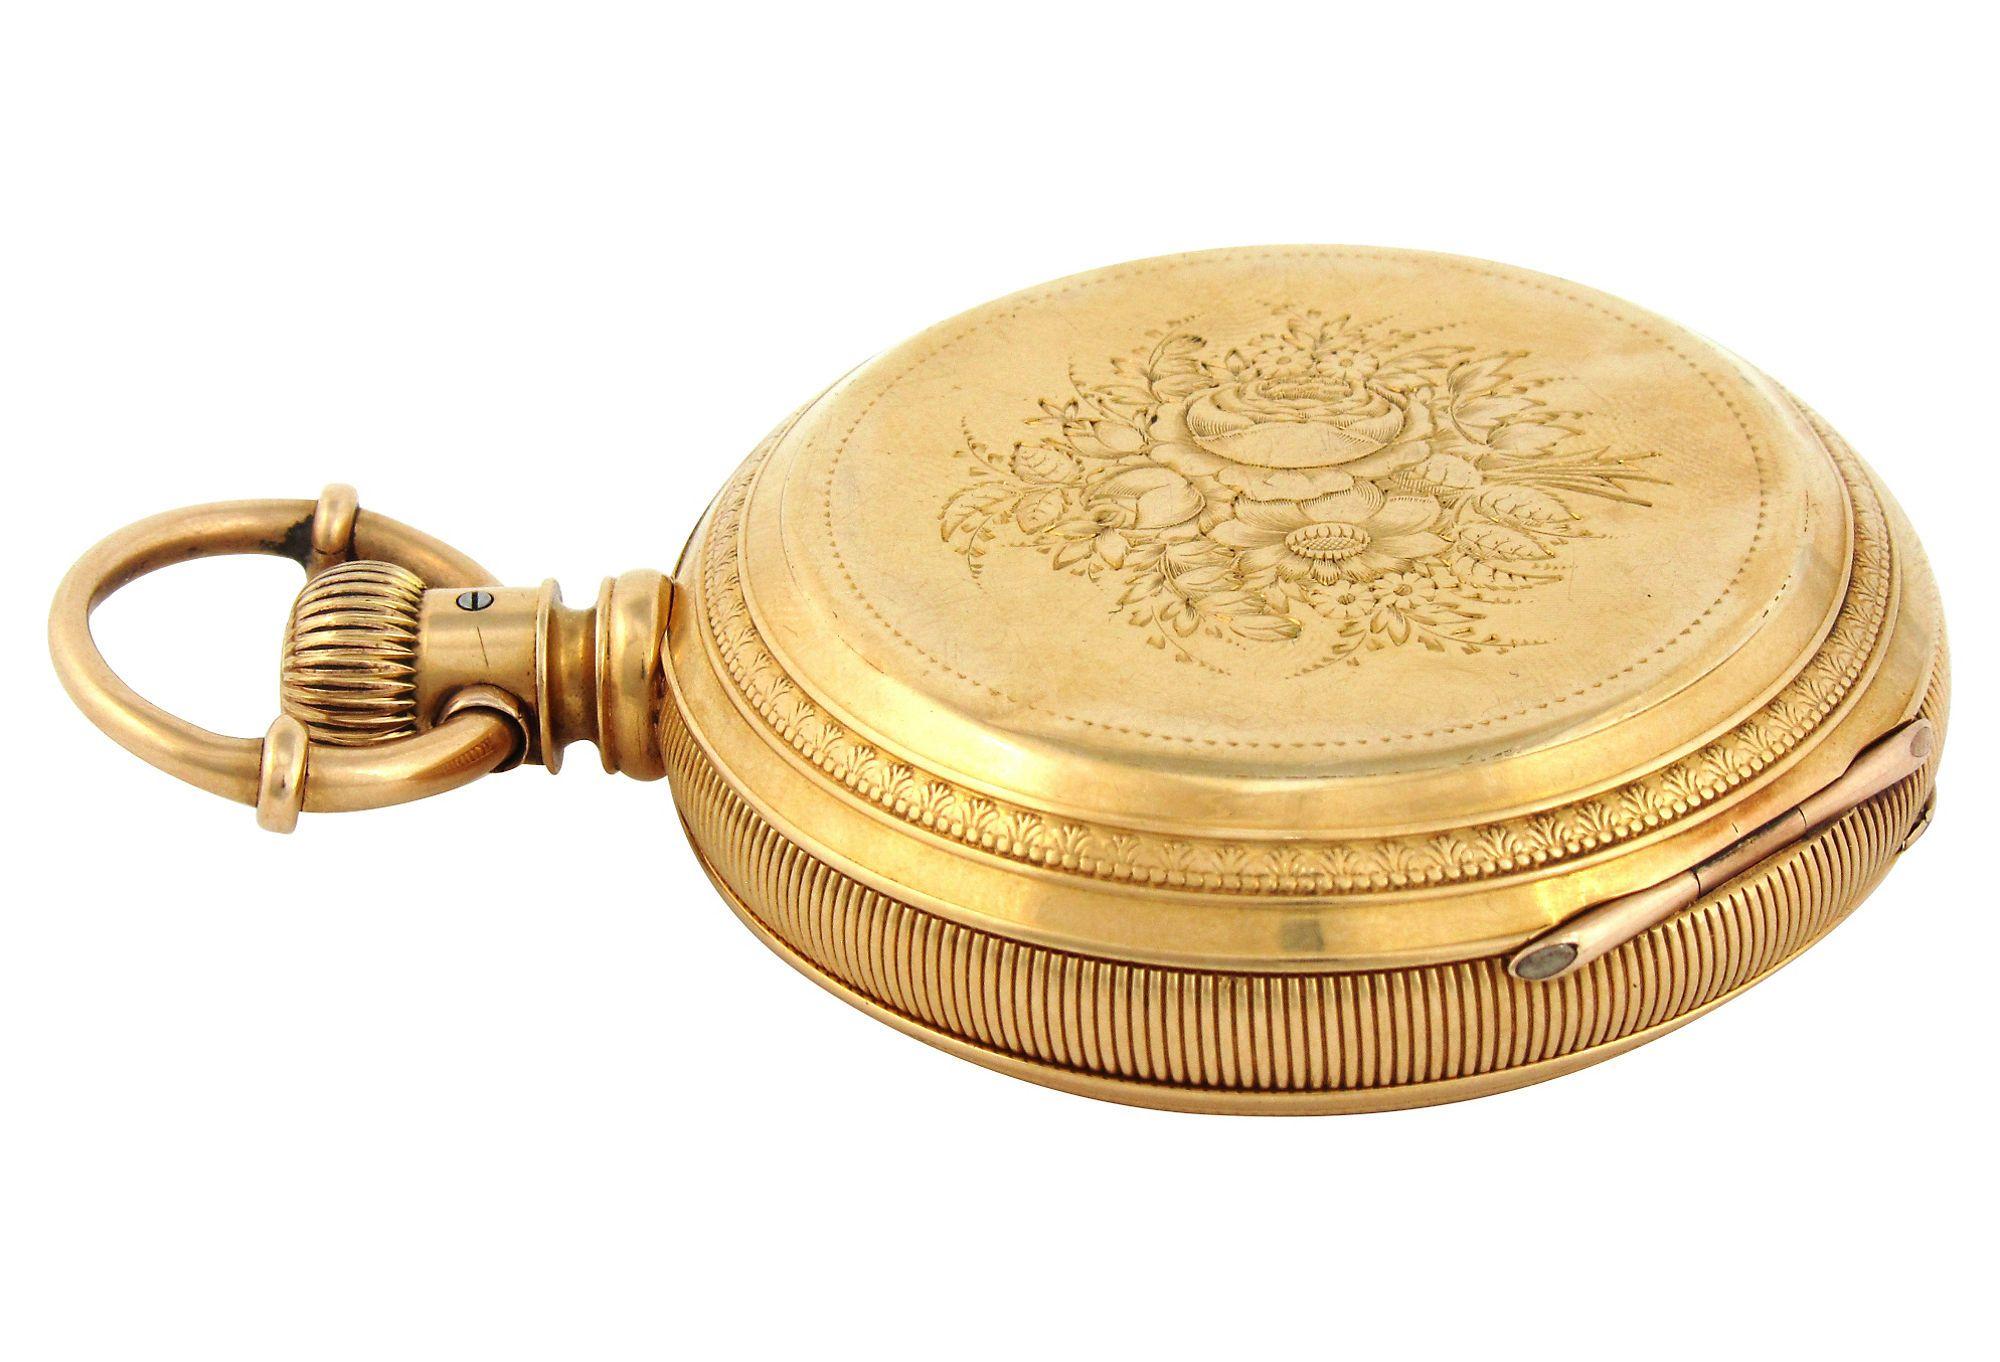 18K Hunter's Case Pocket Watch by Rockford w/ Engraved Decoration